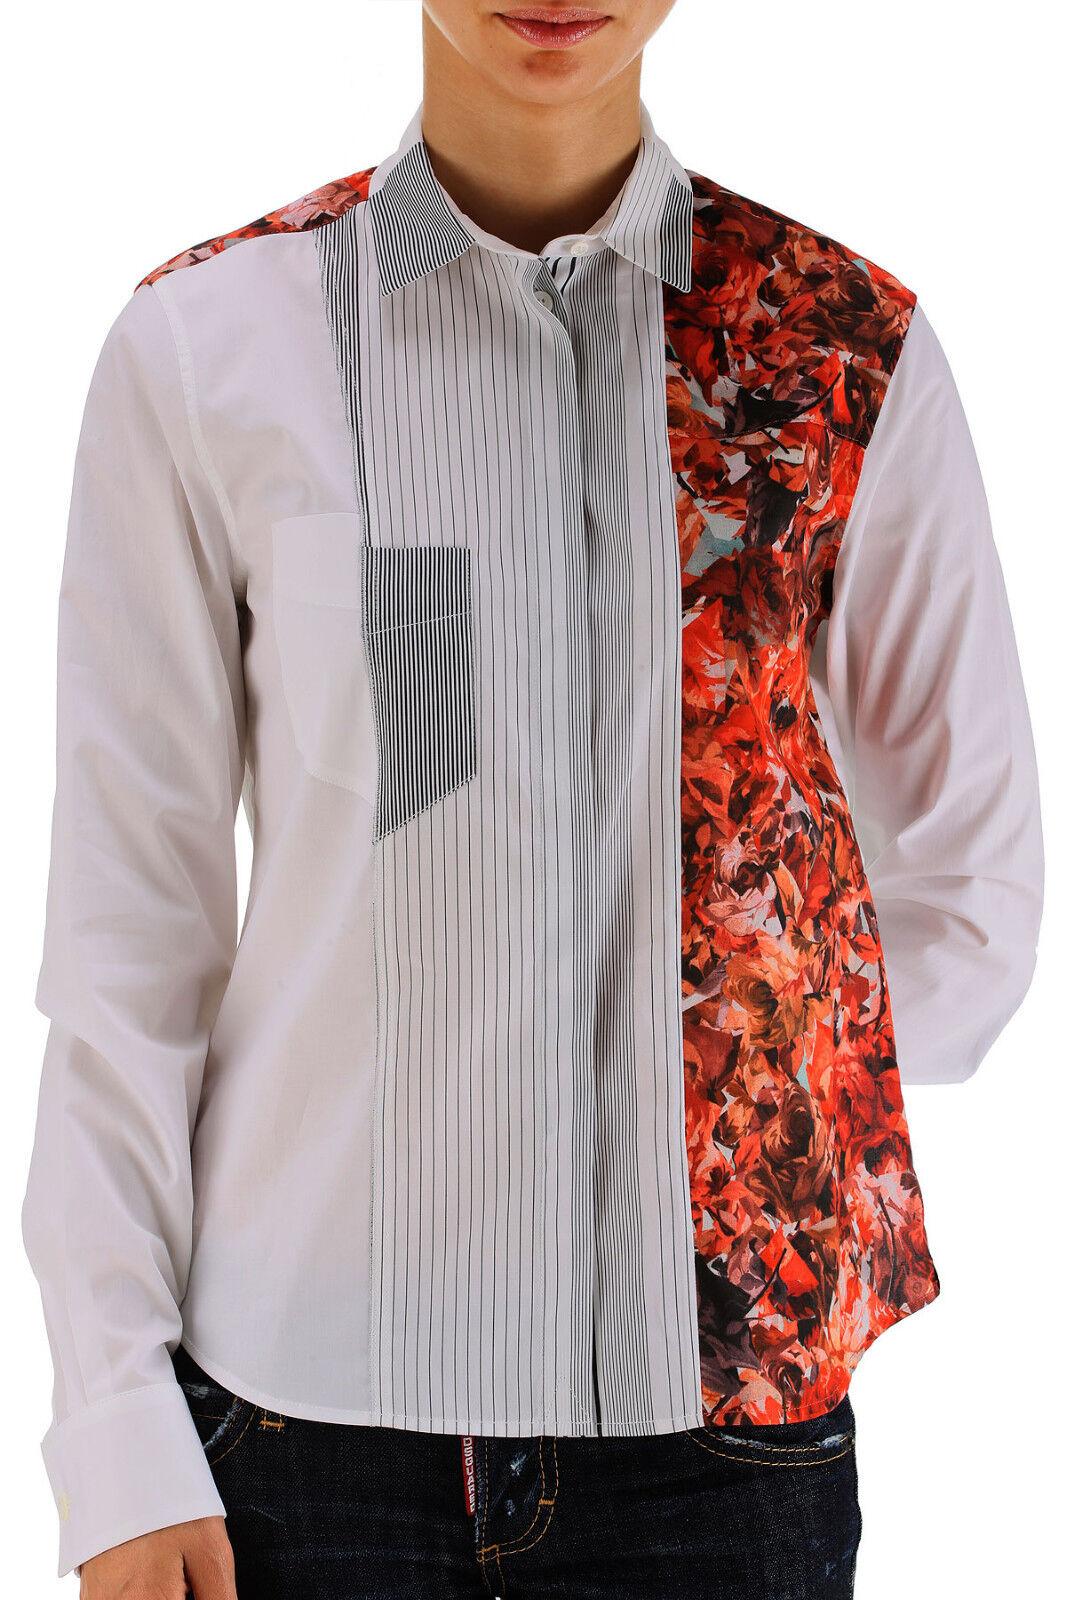 Paul Smith camicia intarsi fiori tg. 40, flower and geometrical print patchwork